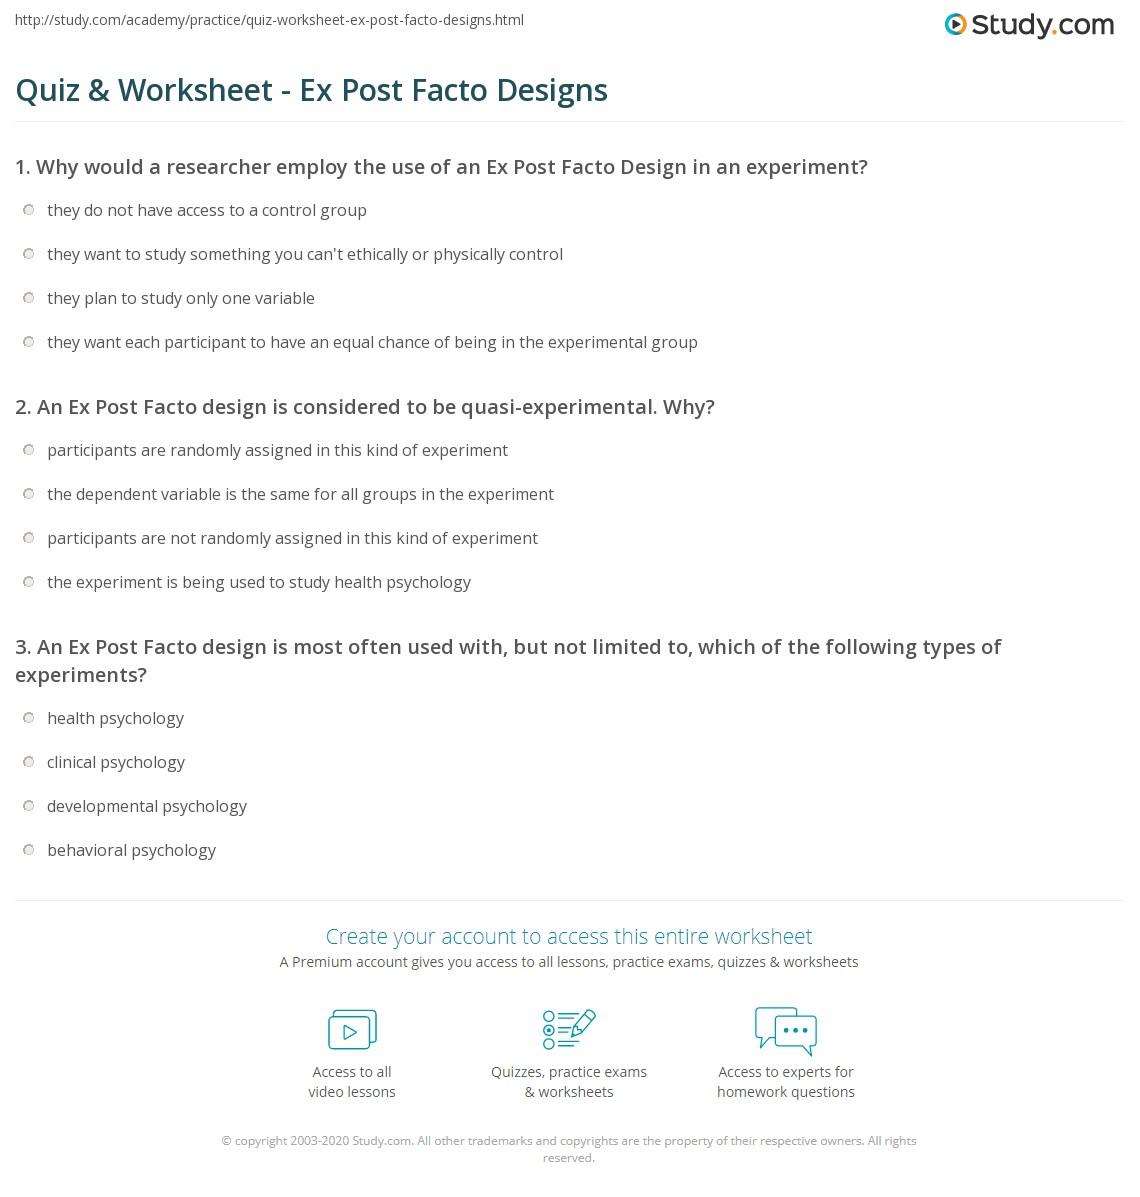 Quiz & Worksheet - Ex Post Facto Designs